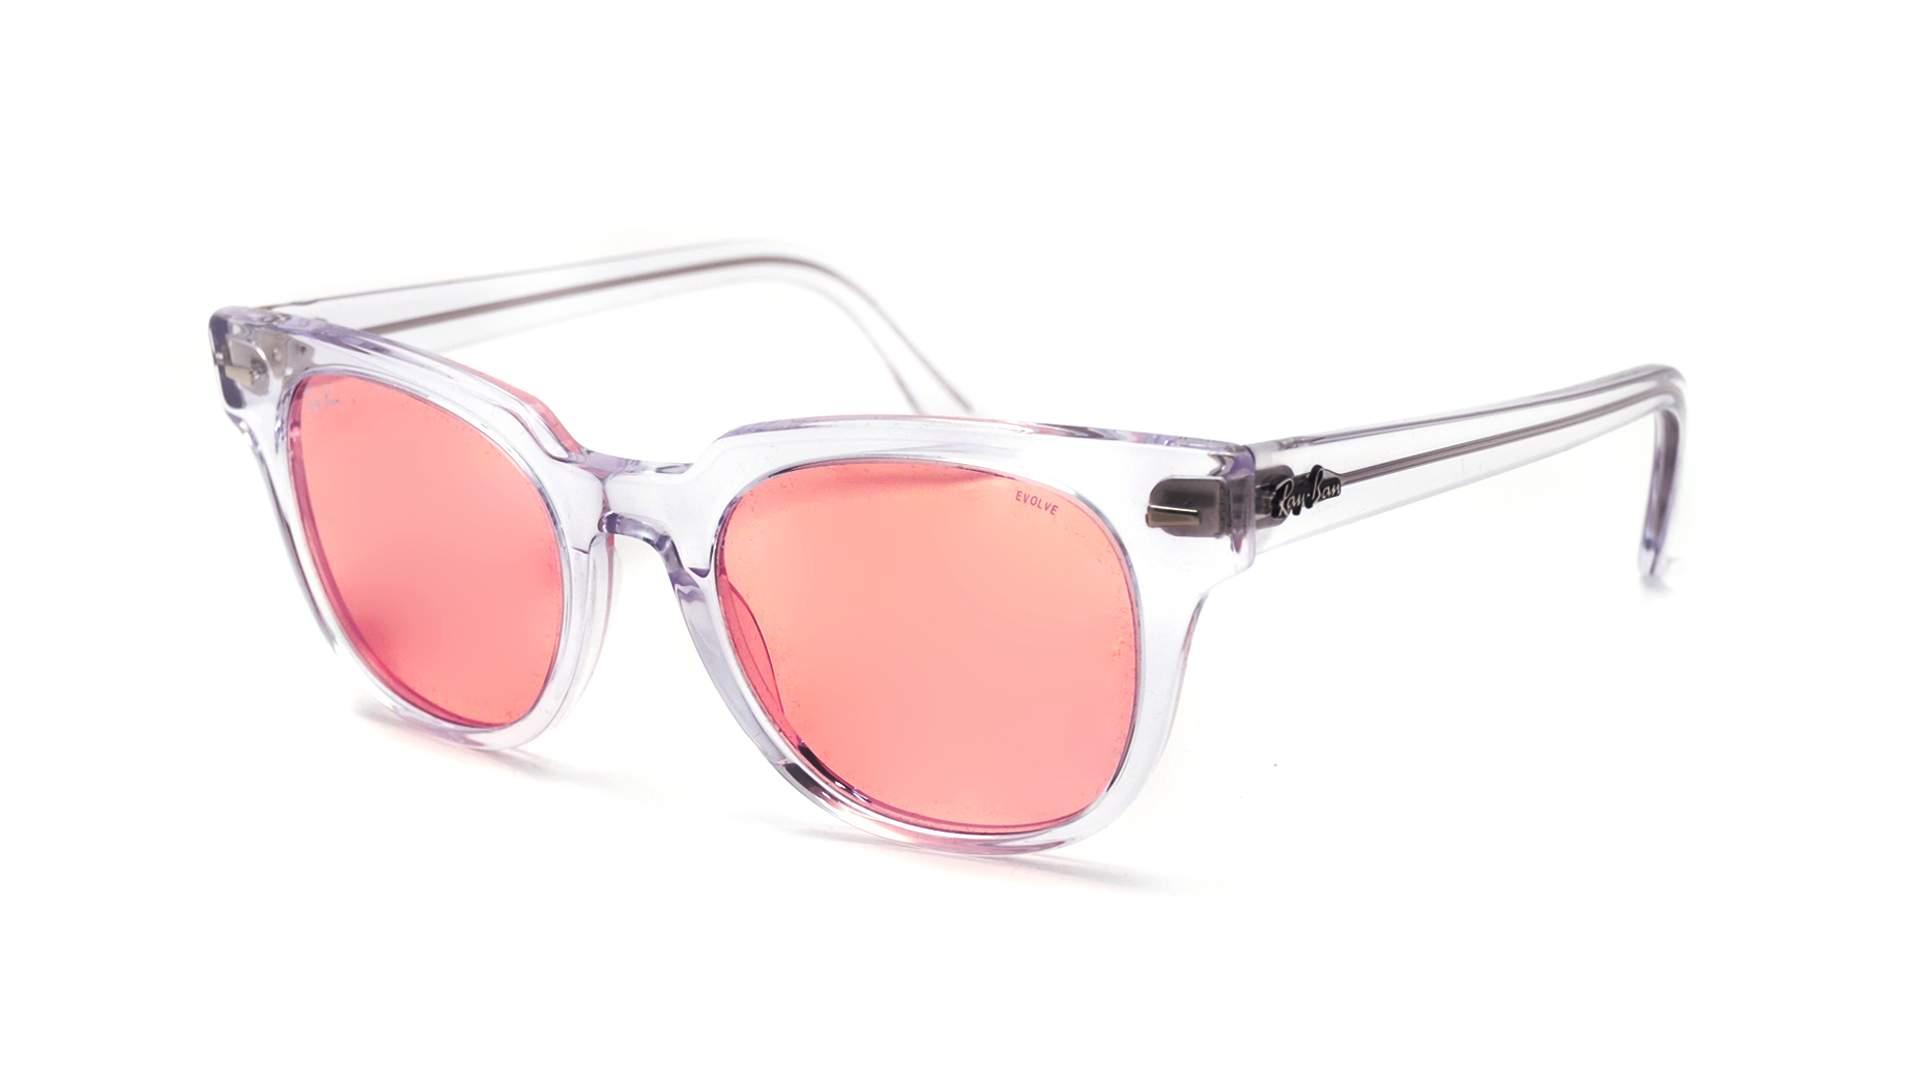 1e21013386 ... cheapest sunglasses ray ban meteor clear evolve rb2168 912 v7 50 20  medium photochromic b5b36 89550